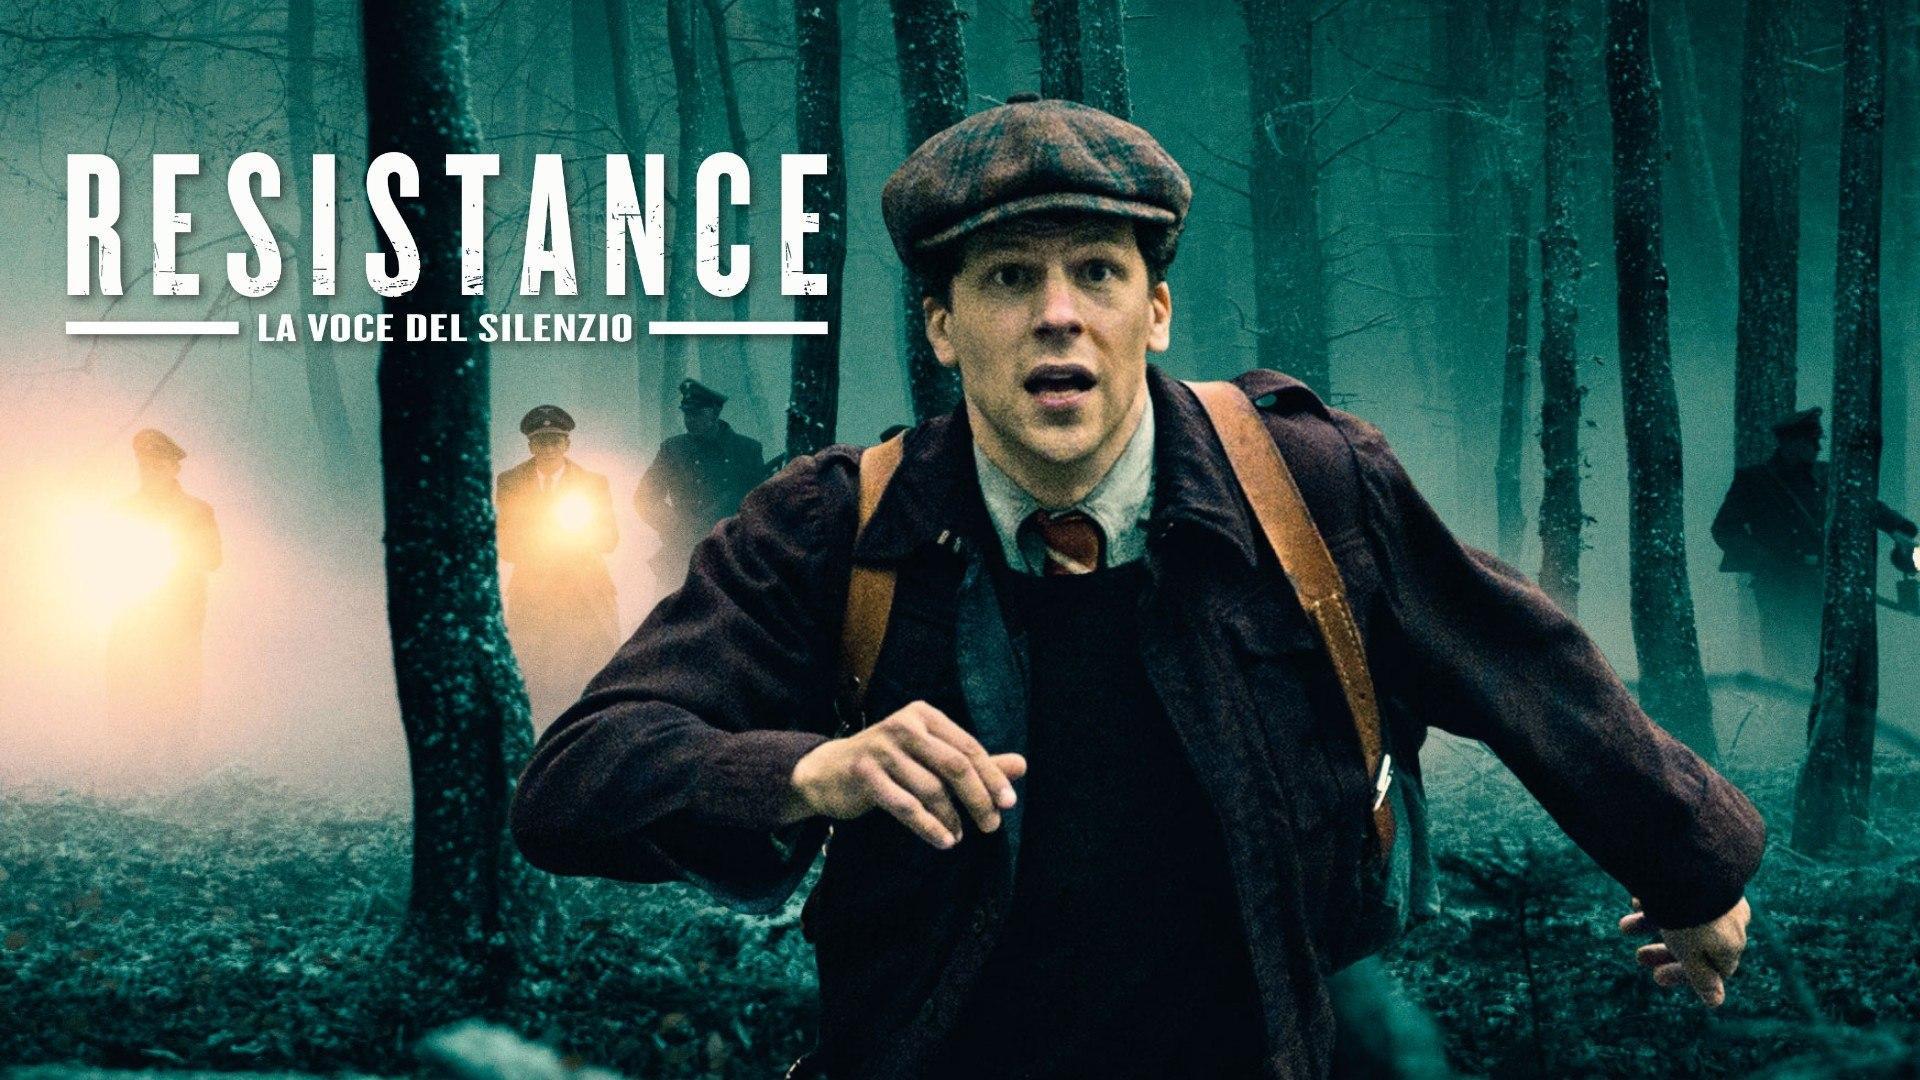 Martedi 15 Dicembre 2020 Sky e Premium Cinema, Resistance